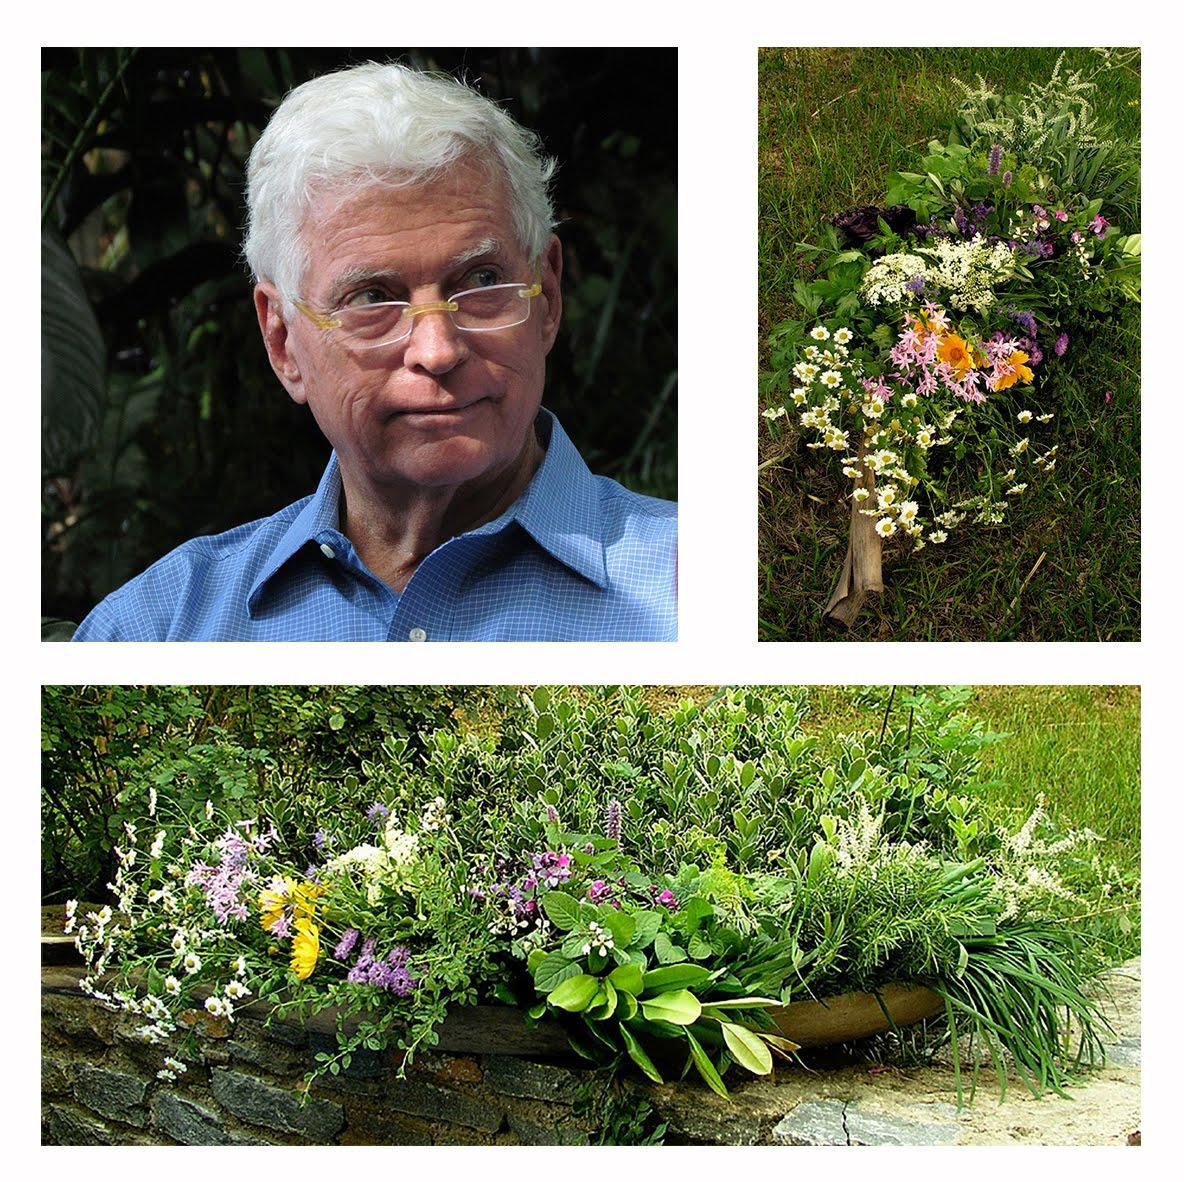 Jardines de gaia jard n bot nico topotepuy en evoluci n for Jardin botanico nocturno 2016